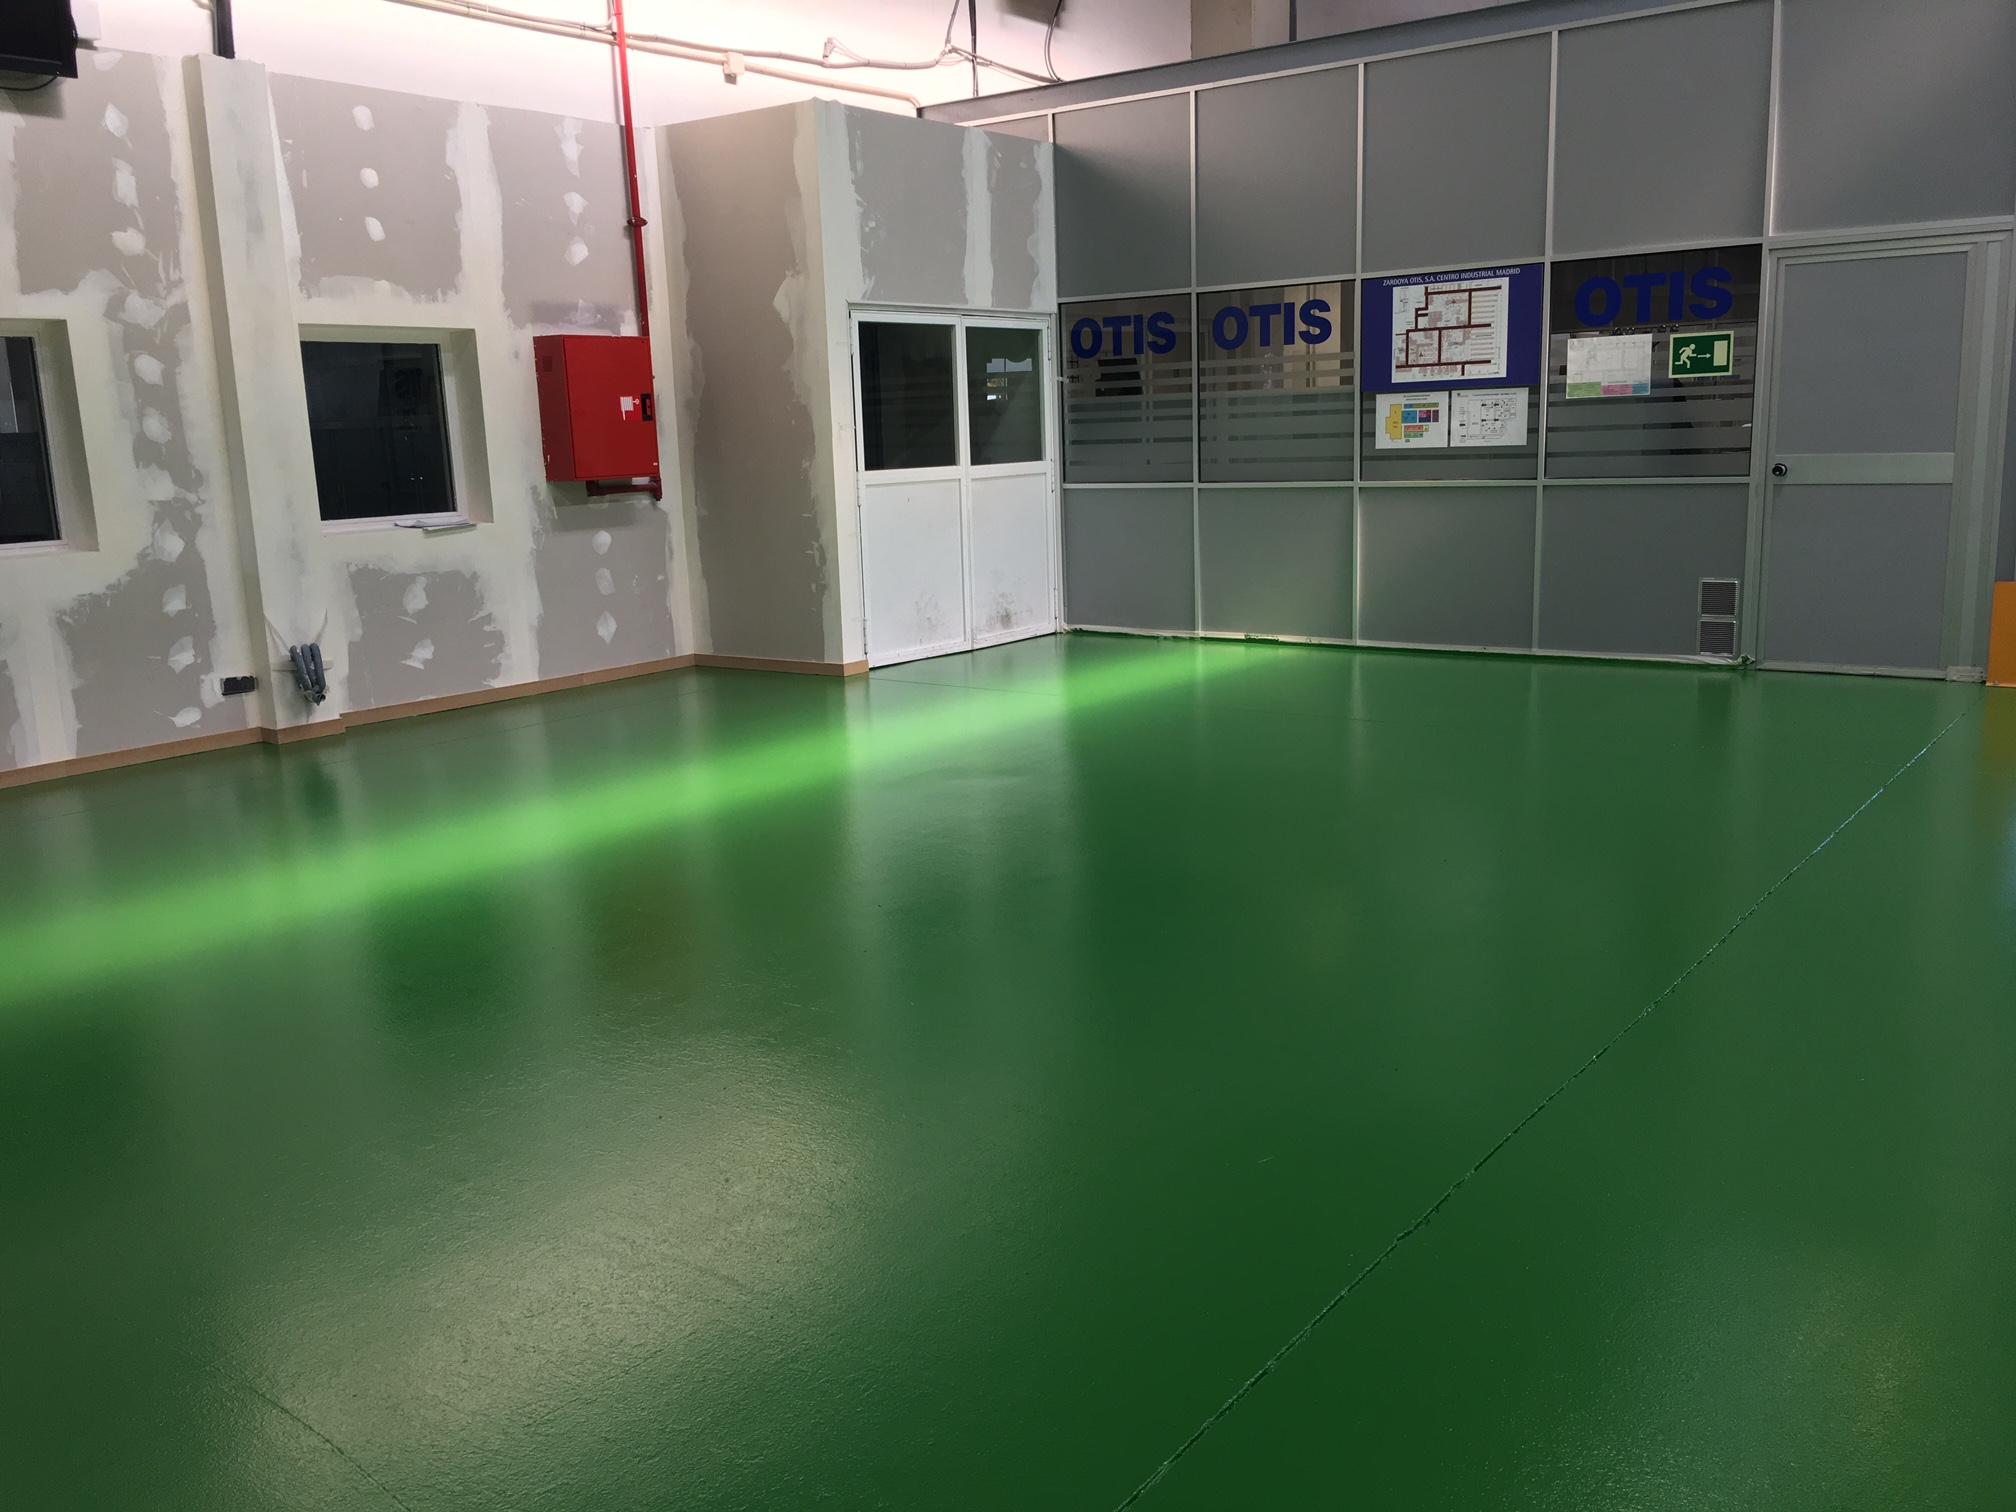 Pavimento de hormigón pulido para OTIS